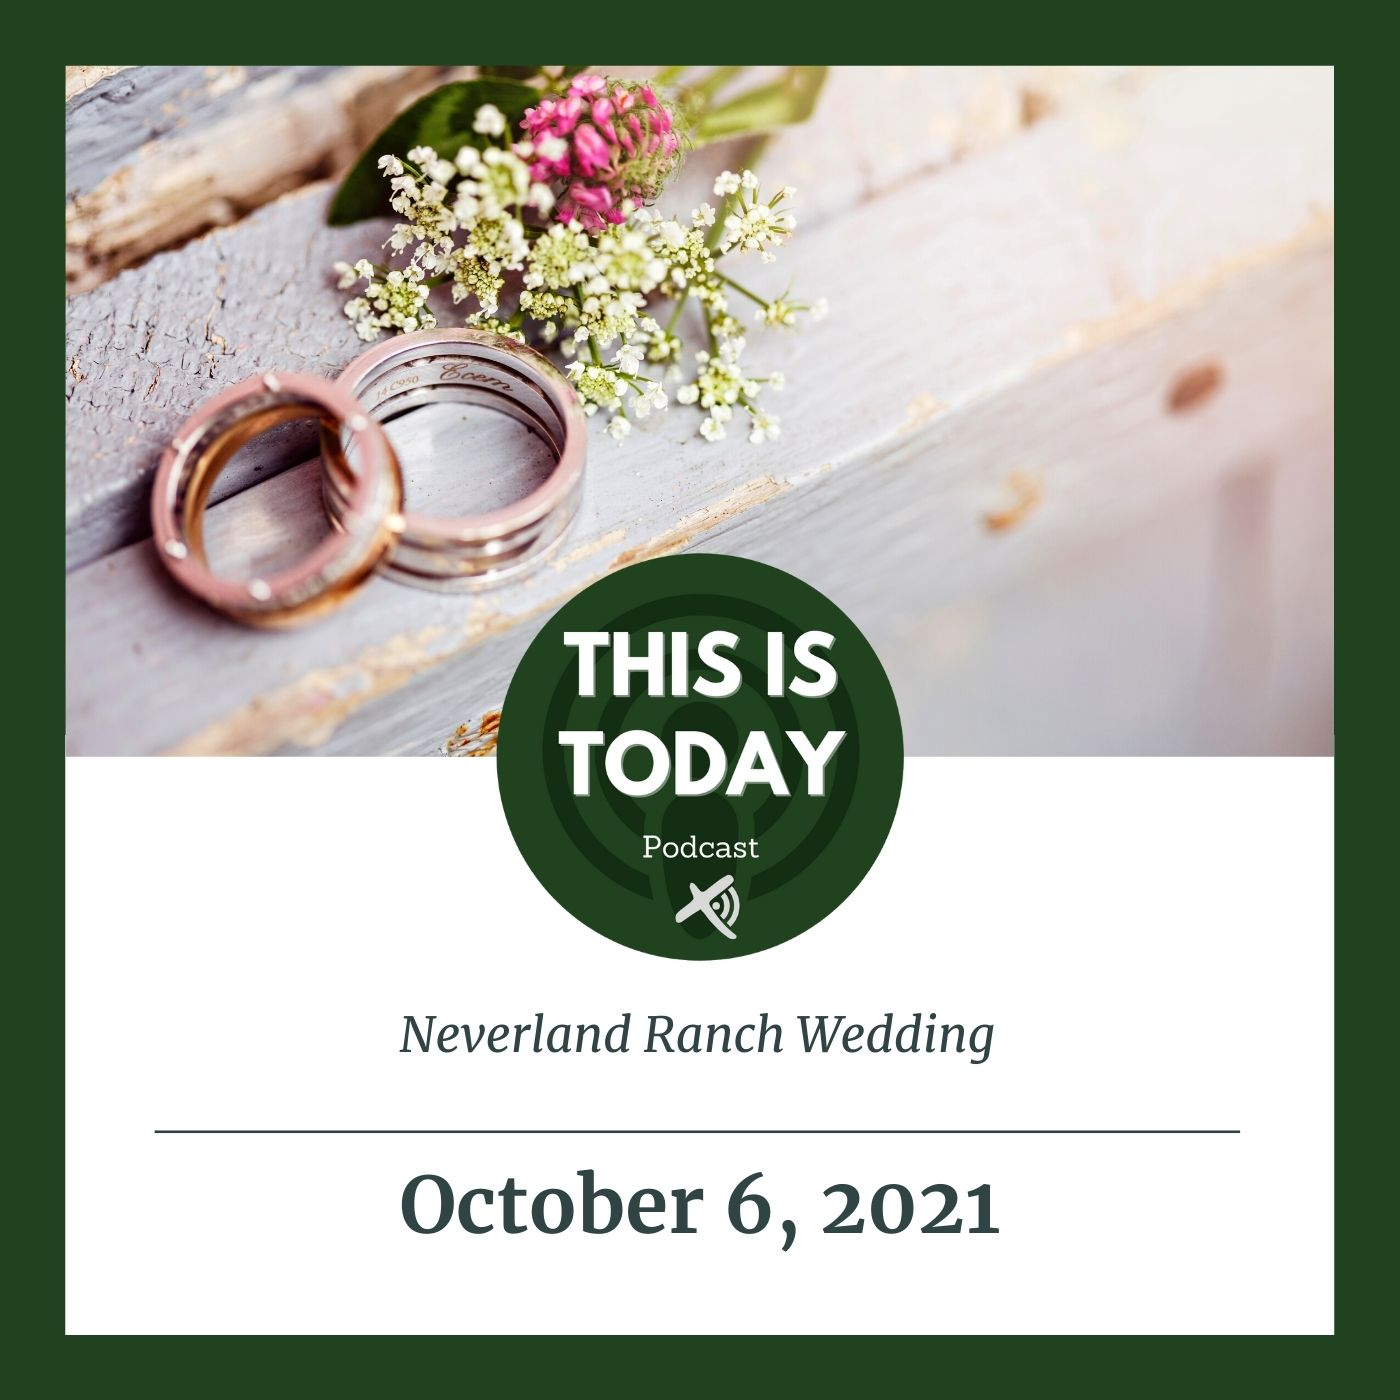 Neverland Ranch Wedding